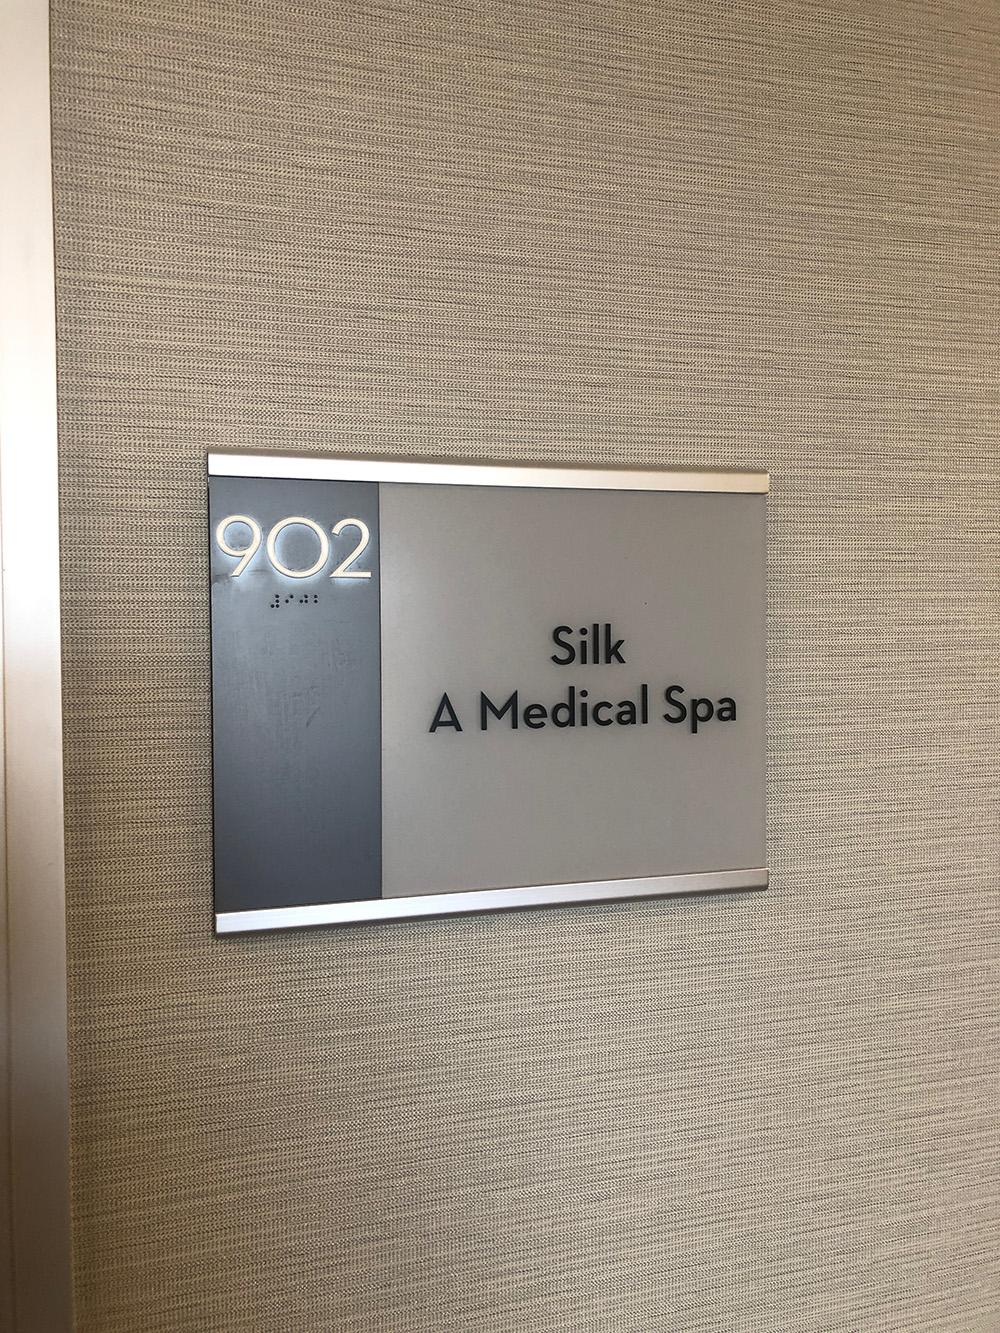 Silk, A Medical Spa is located in Encino, California.